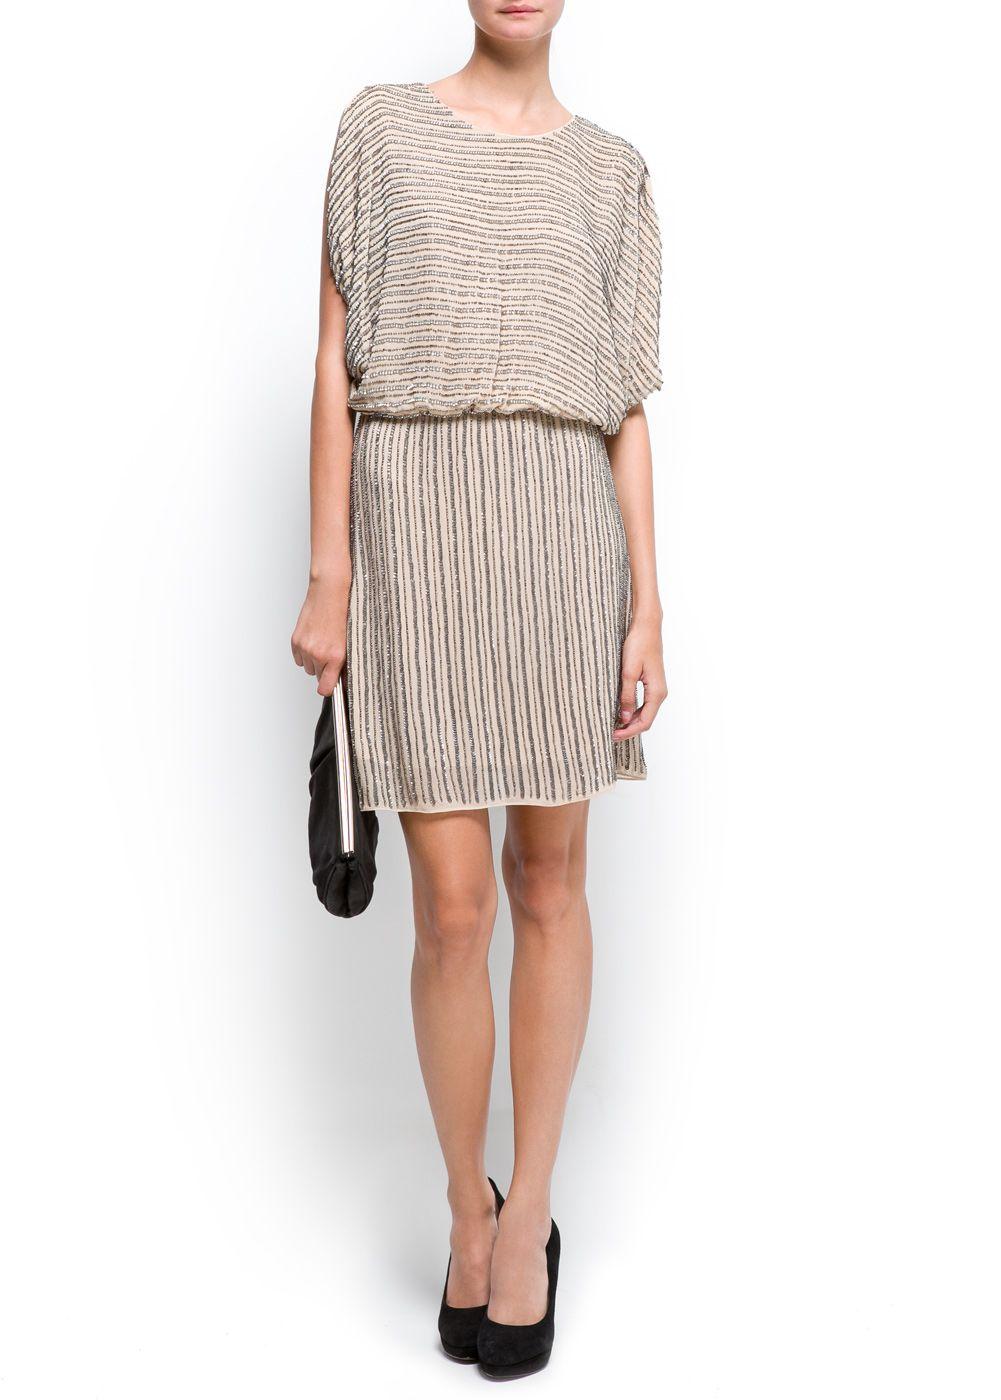 MANGO - CLOTHING - Dresses - Chiffon dress with sequins